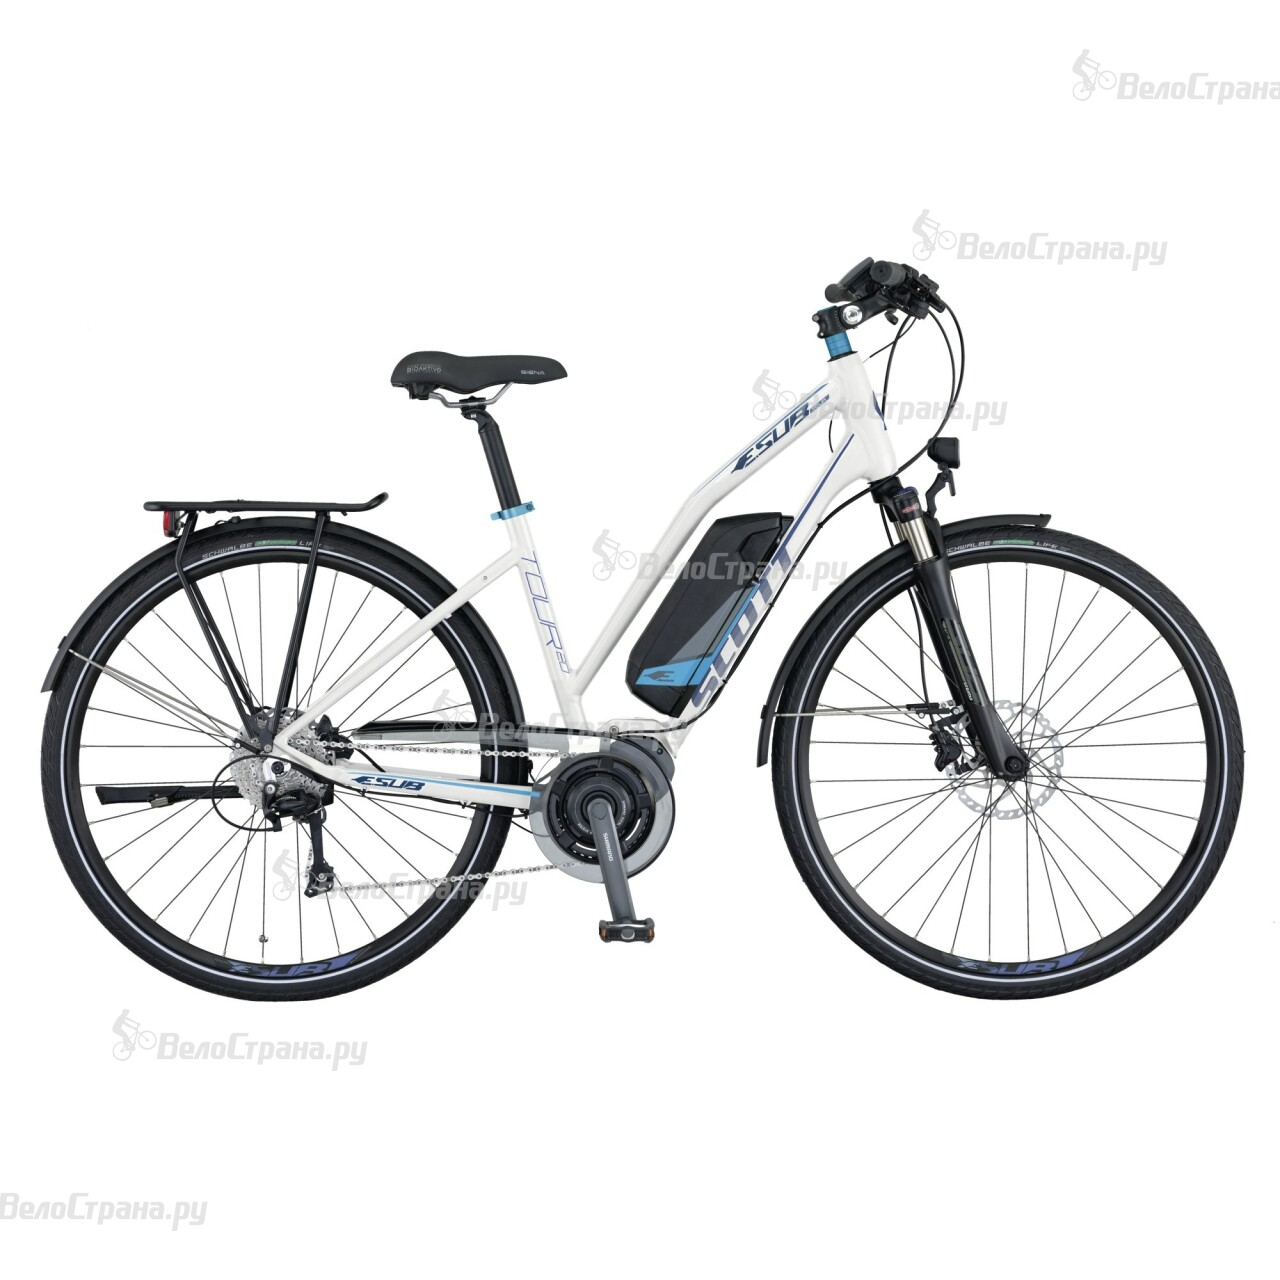 Велосипед Scott E.SUB Tour 20 Lady (2015) scott addict sl compact 2015